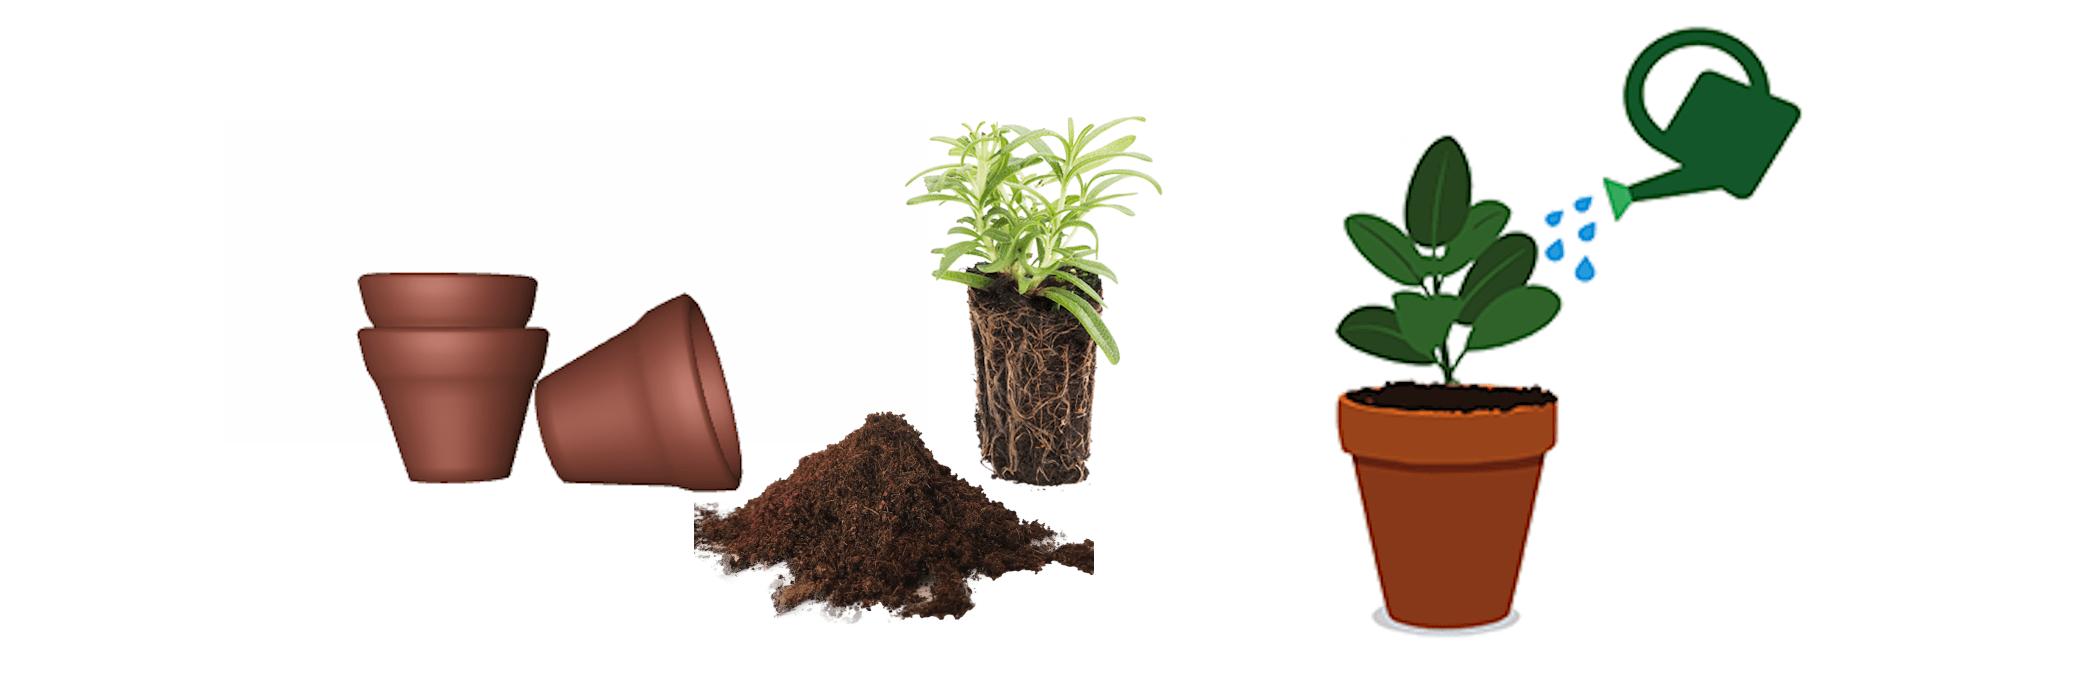 transplantare-plante-apartament